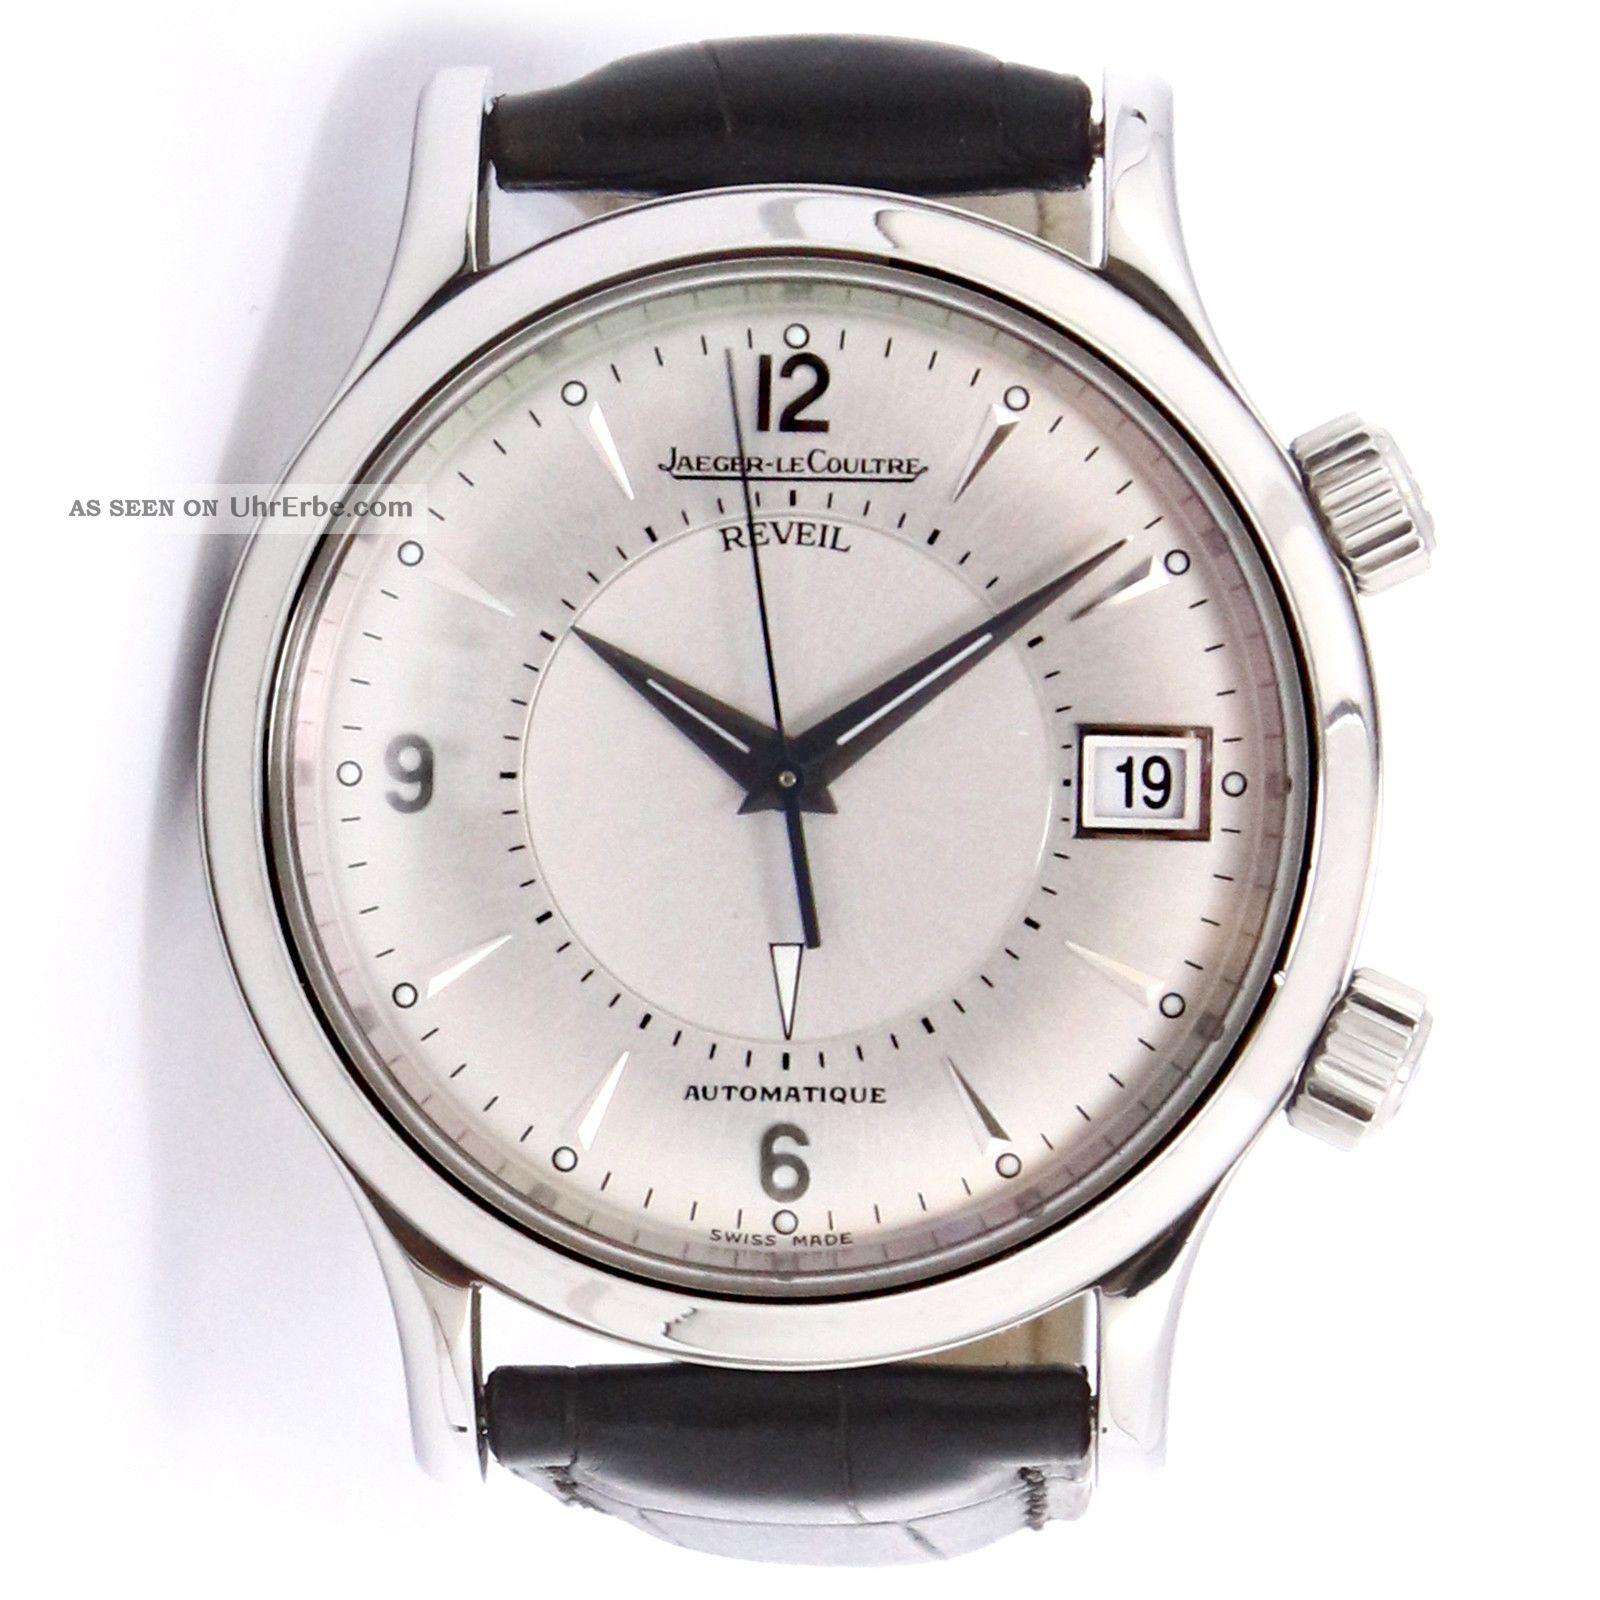 Armbanduhr Jaeger Lecoultre Master Reveil Edelstahl Automatische 141.  8.  97 Armbanduhren Bild